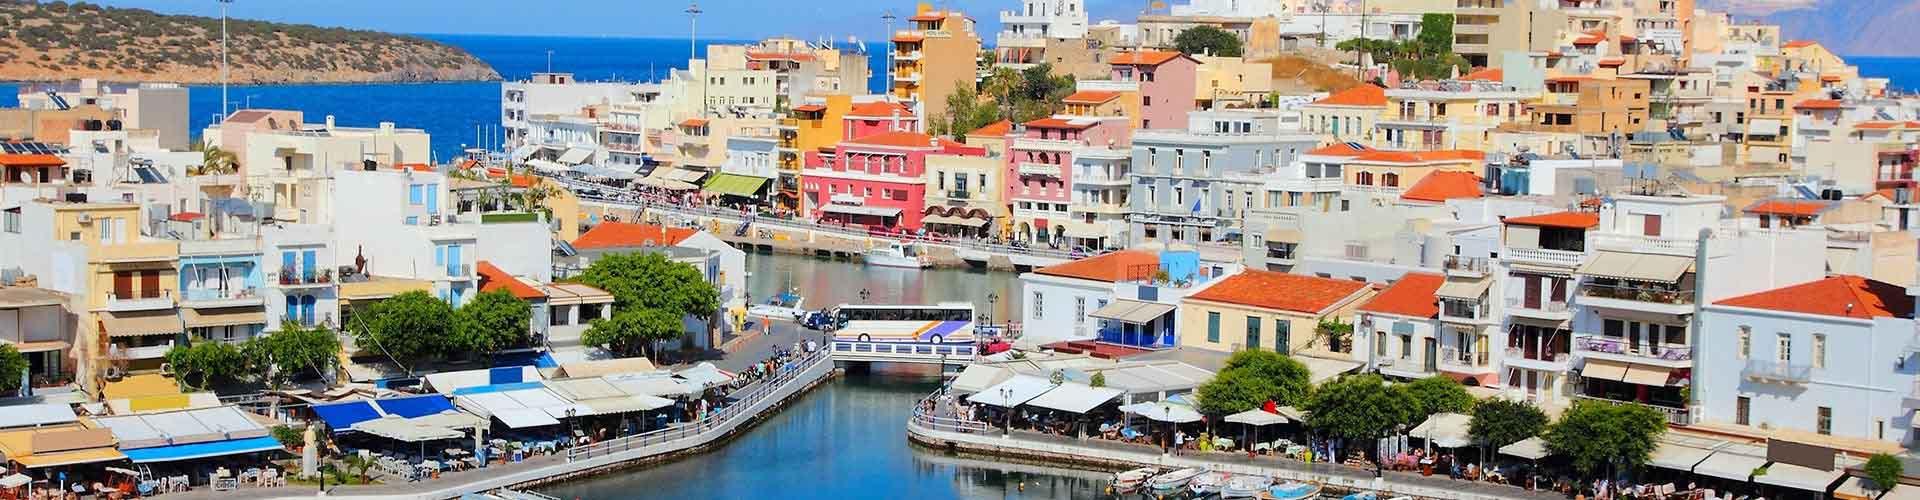 Crète - Camping à Crète. Cartes pour Crète, photos et commentaires pour chaque Camping à Crète.